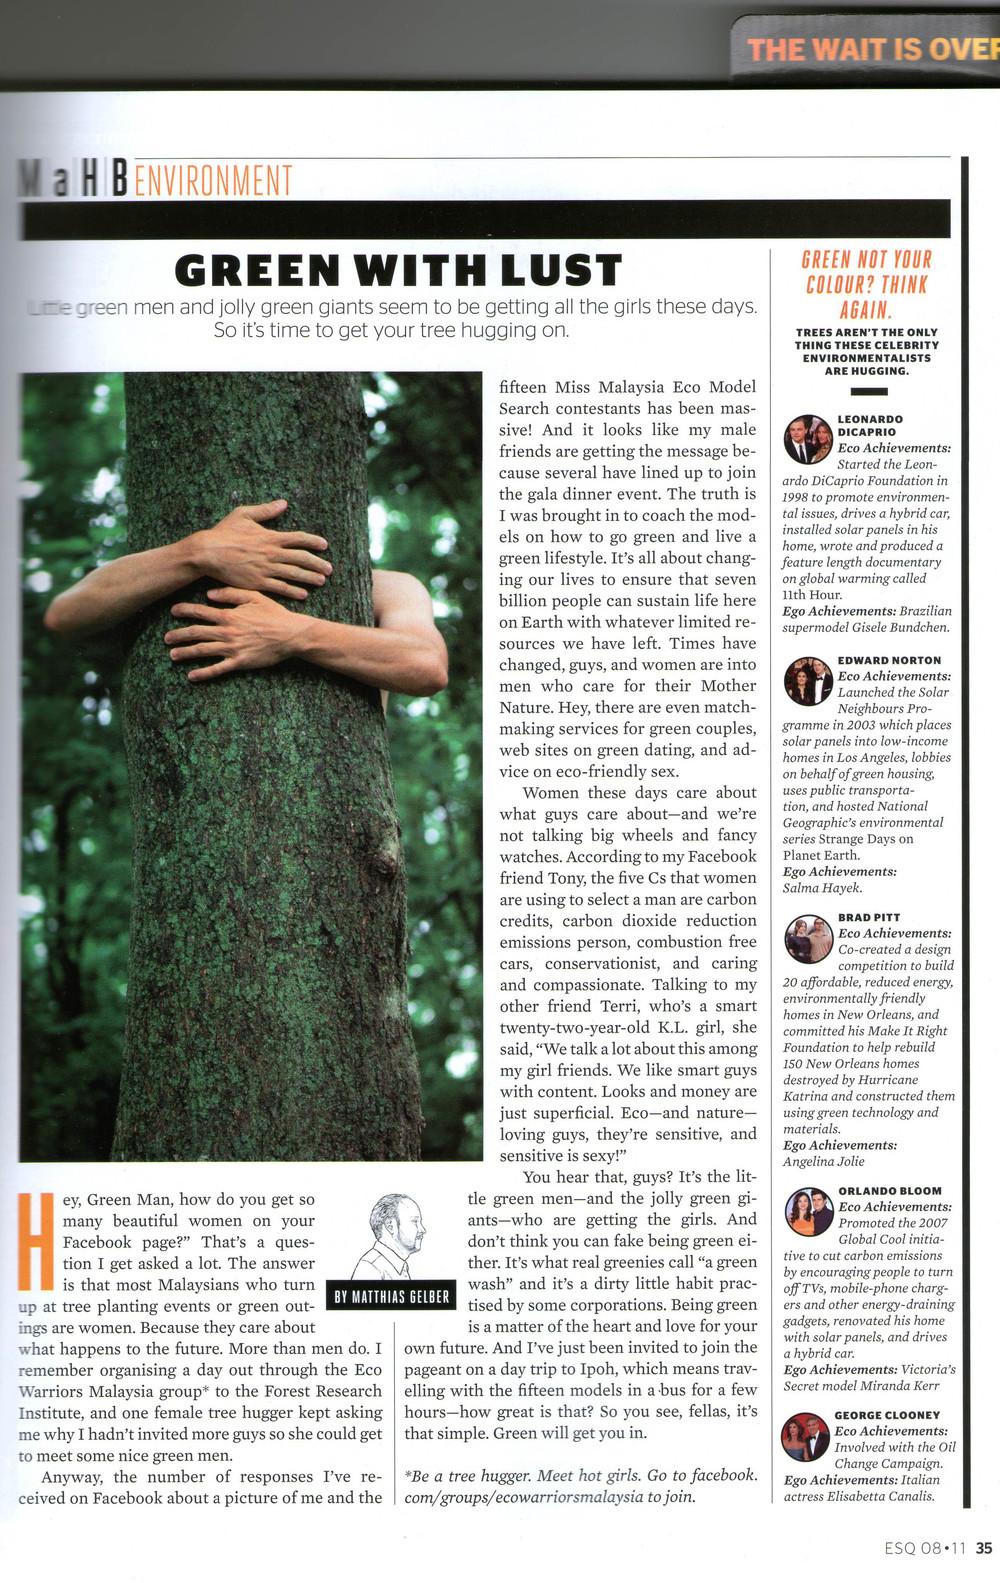 All For Lust 2003 esquire press — green man: matthias gelber